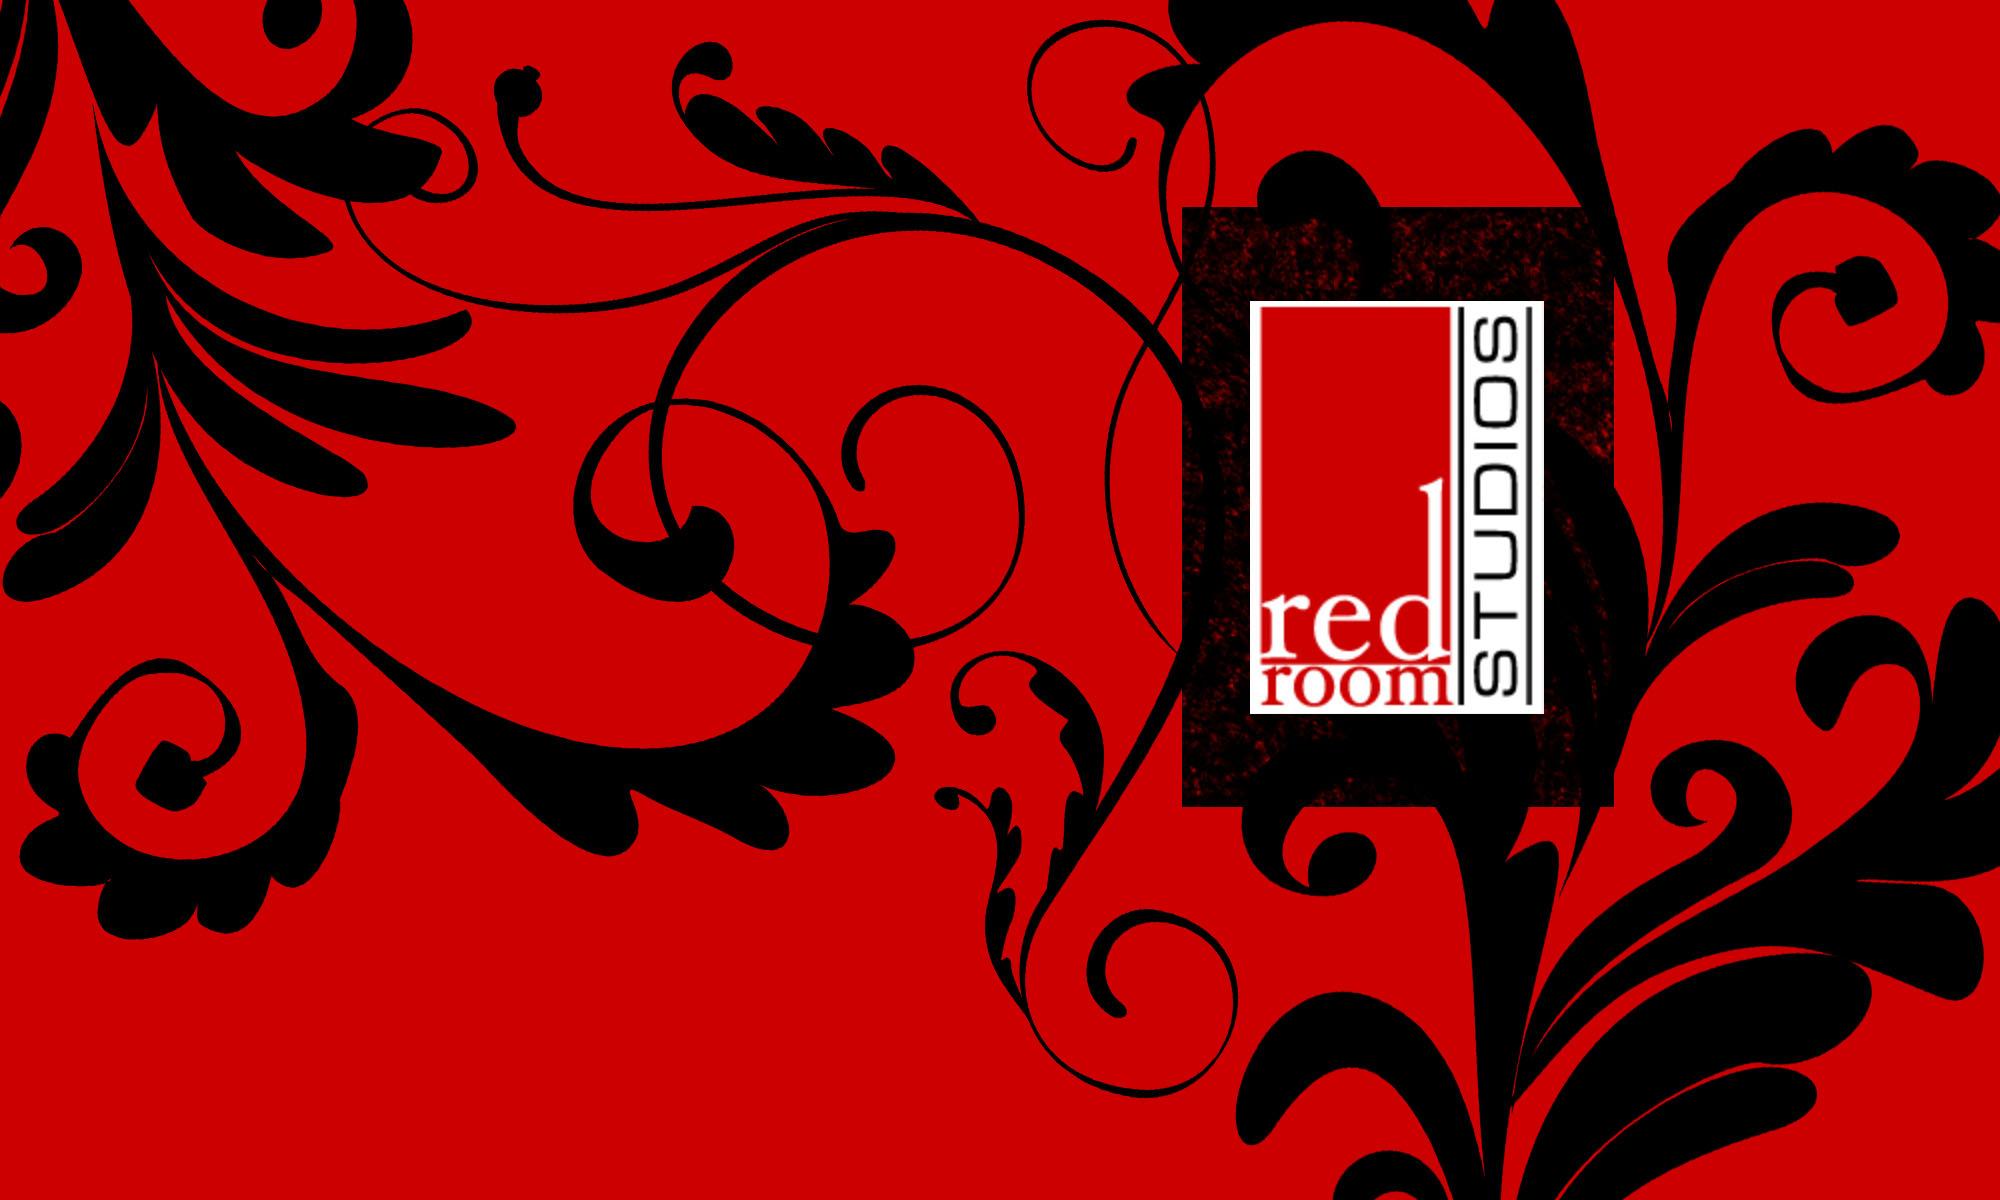 Red Room Studios